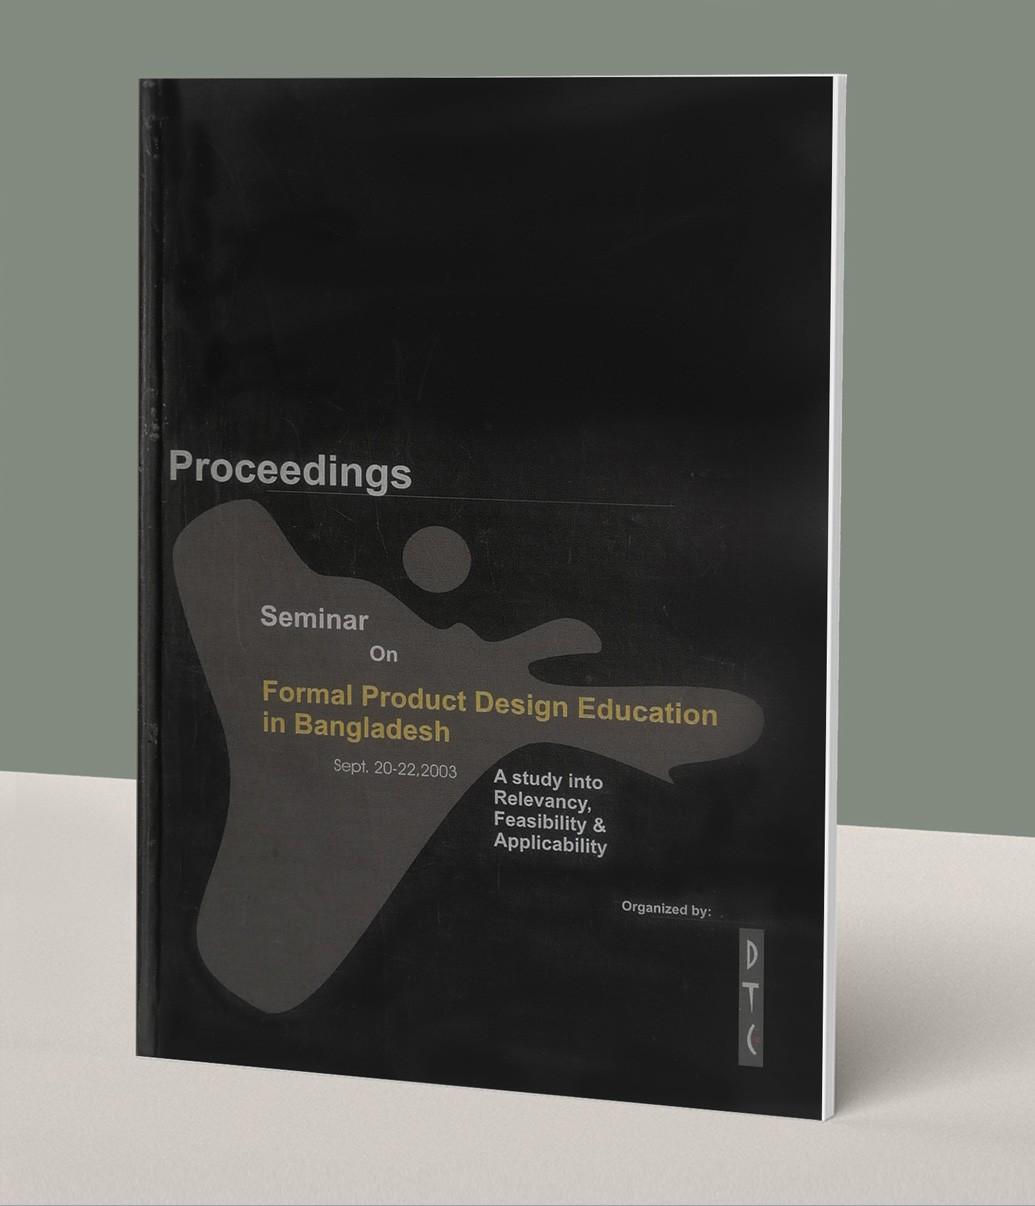 Proceedings of Seminar on Formal Product Design Education in Bangladesh